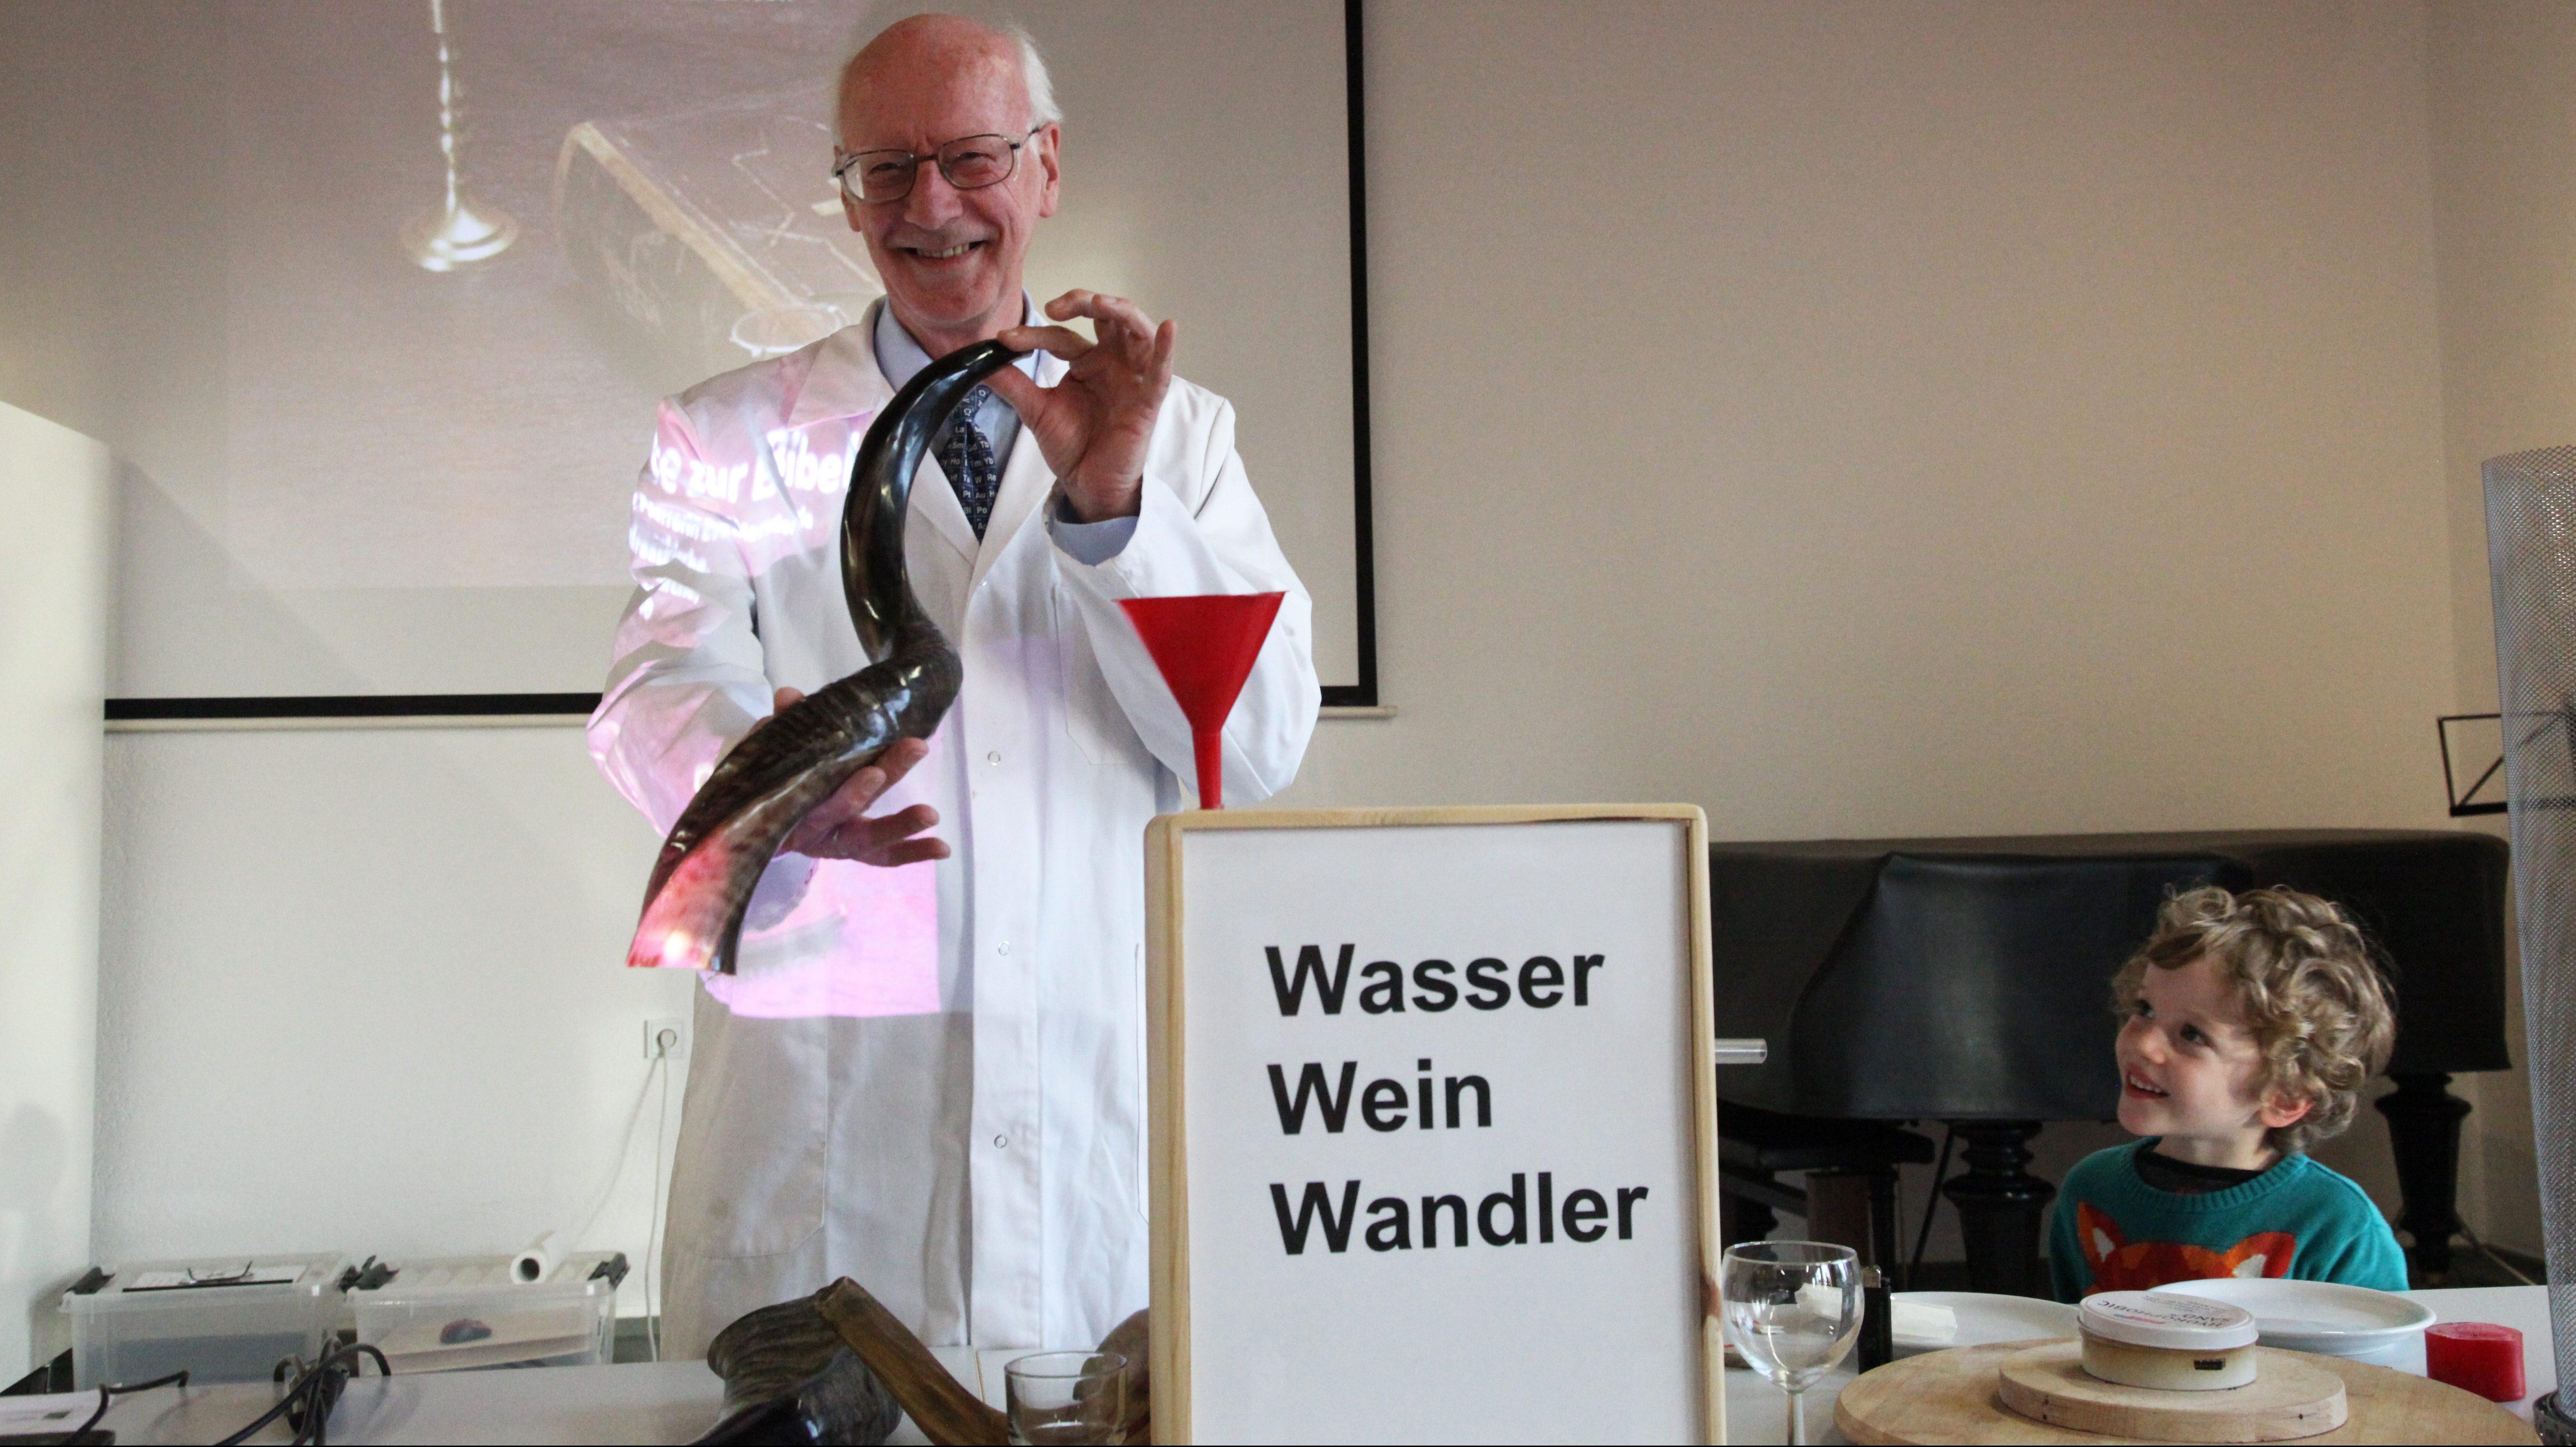 Feuersäule & Co: Experimente zur Bibel – Chemiker Dr. Gerhard Heywang fasziniert mit originell-informativem Experimentalvortrag zu Phänomenen der Heiligen Schrift